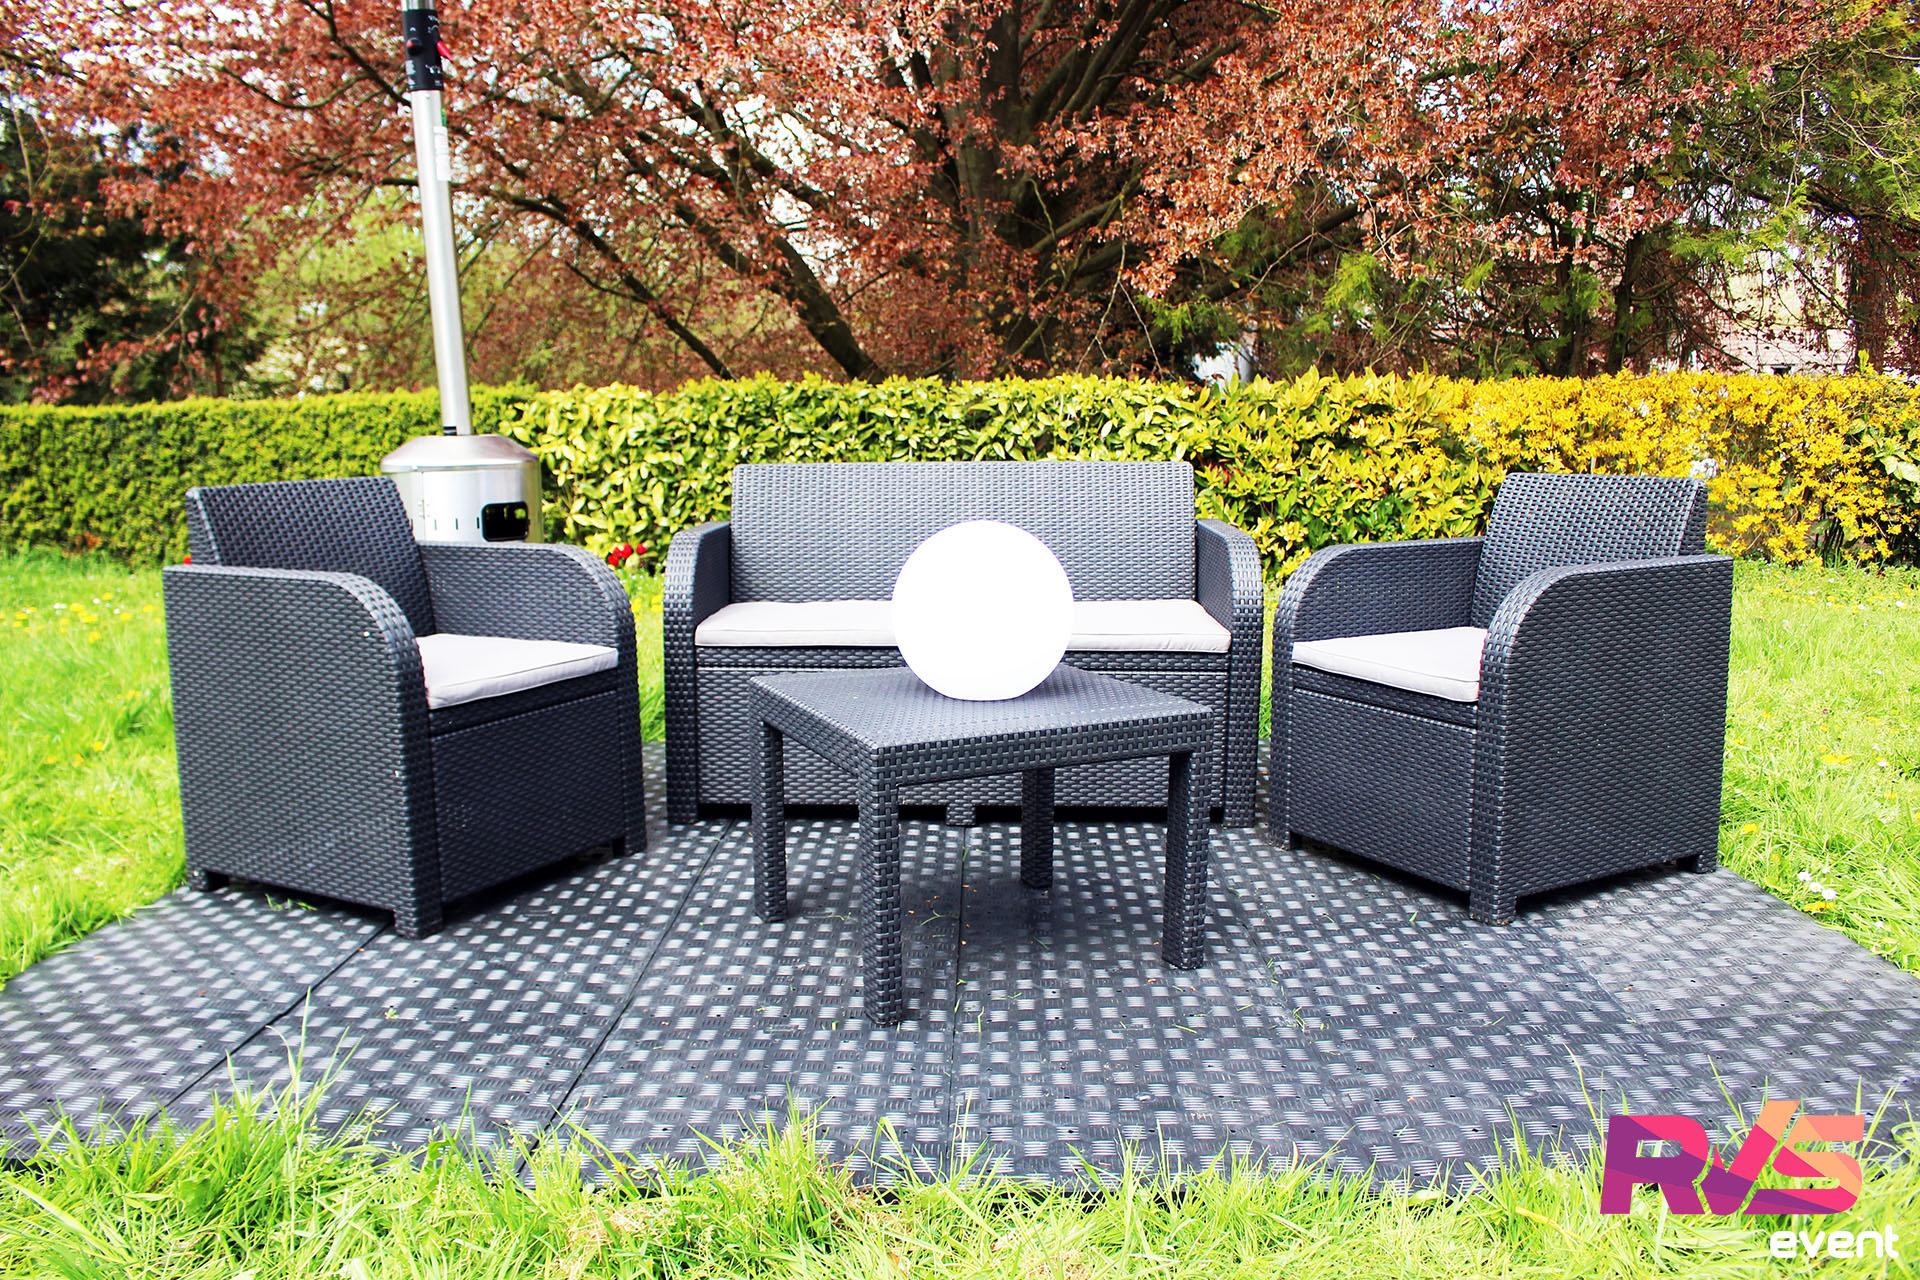 location salons d 39 t tente 3x3 mobilier rvs event. Black Bedroom Furniture Sets. Home Design Ideas